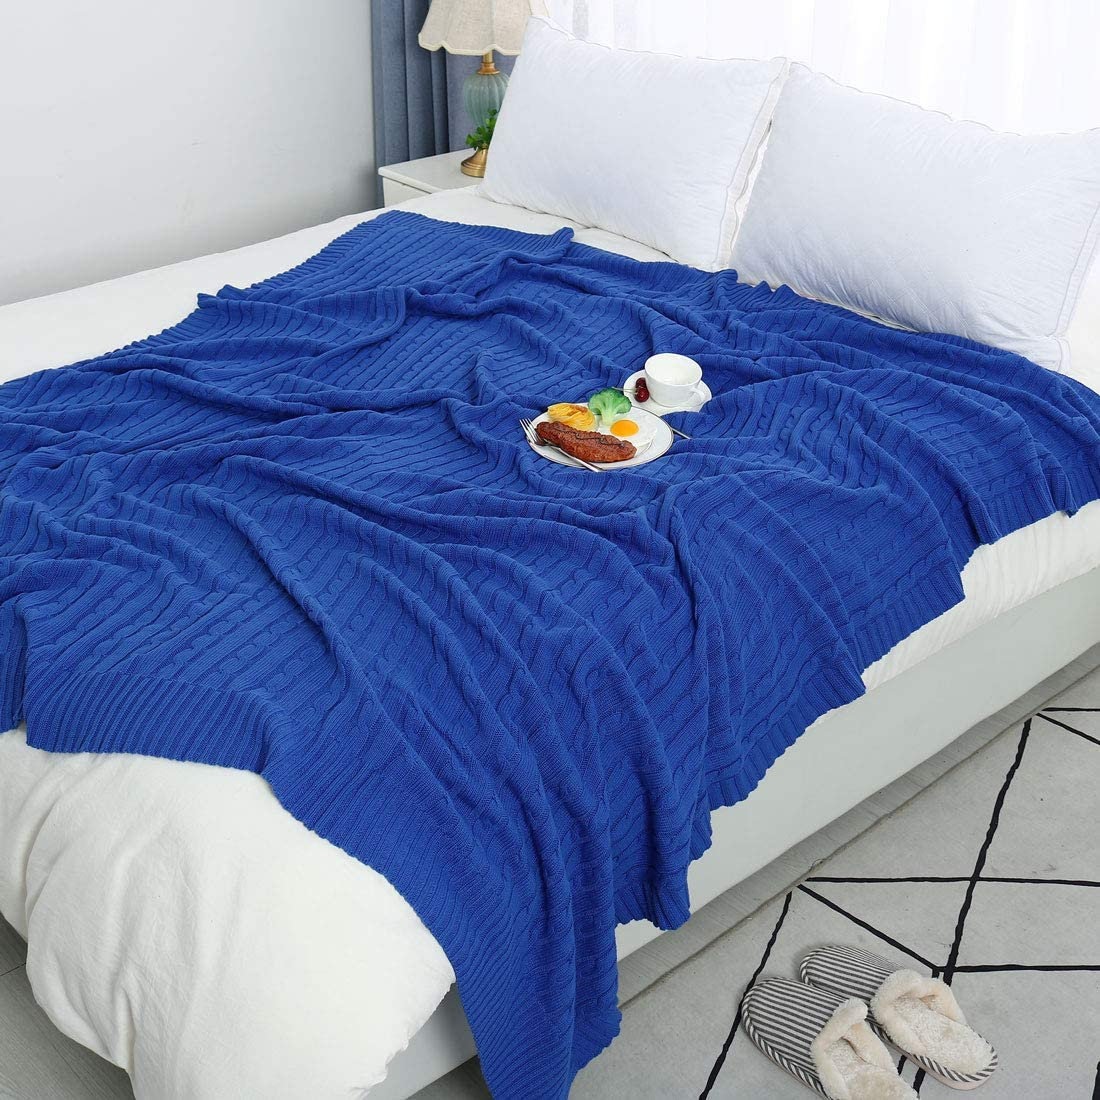 Sourcingmap azul muy suave cama Throw Manta de punto de algod/ón 47 x 70 para sof/á